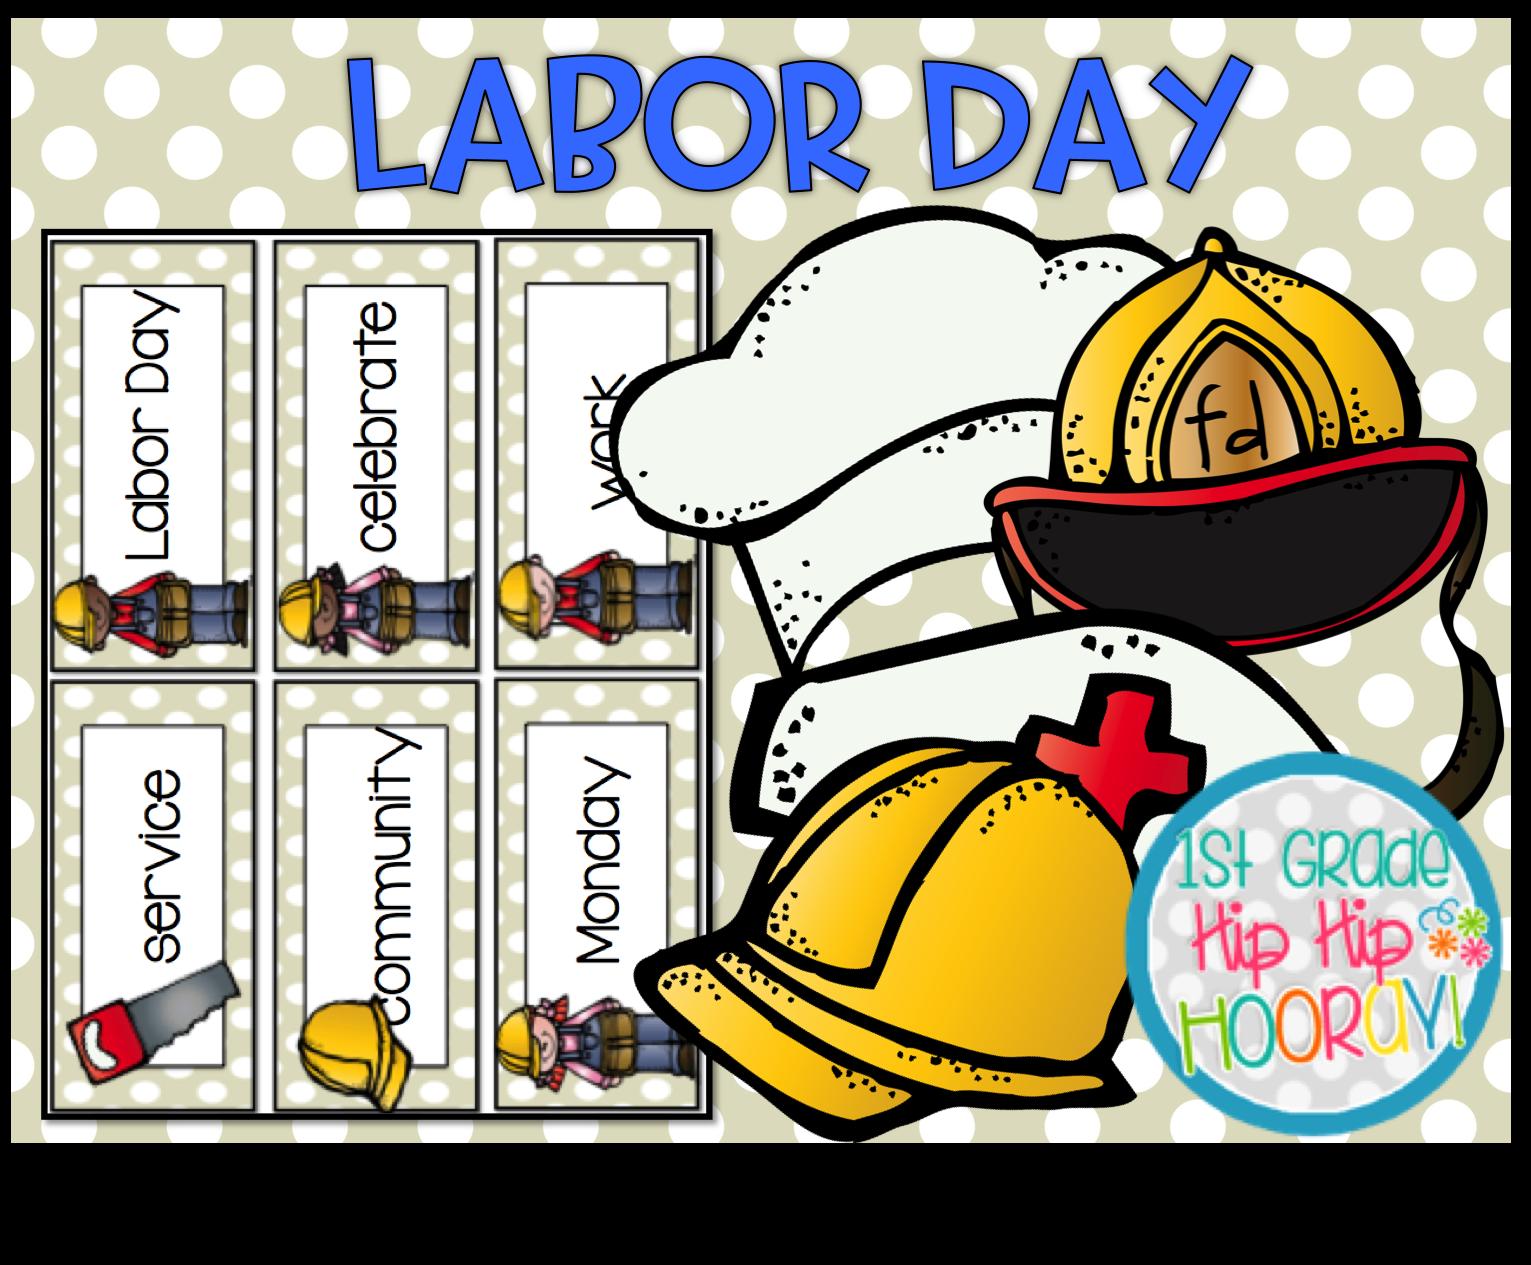 hight resolution of 1st Grade Hip Hip Hooray!: Labor Day!